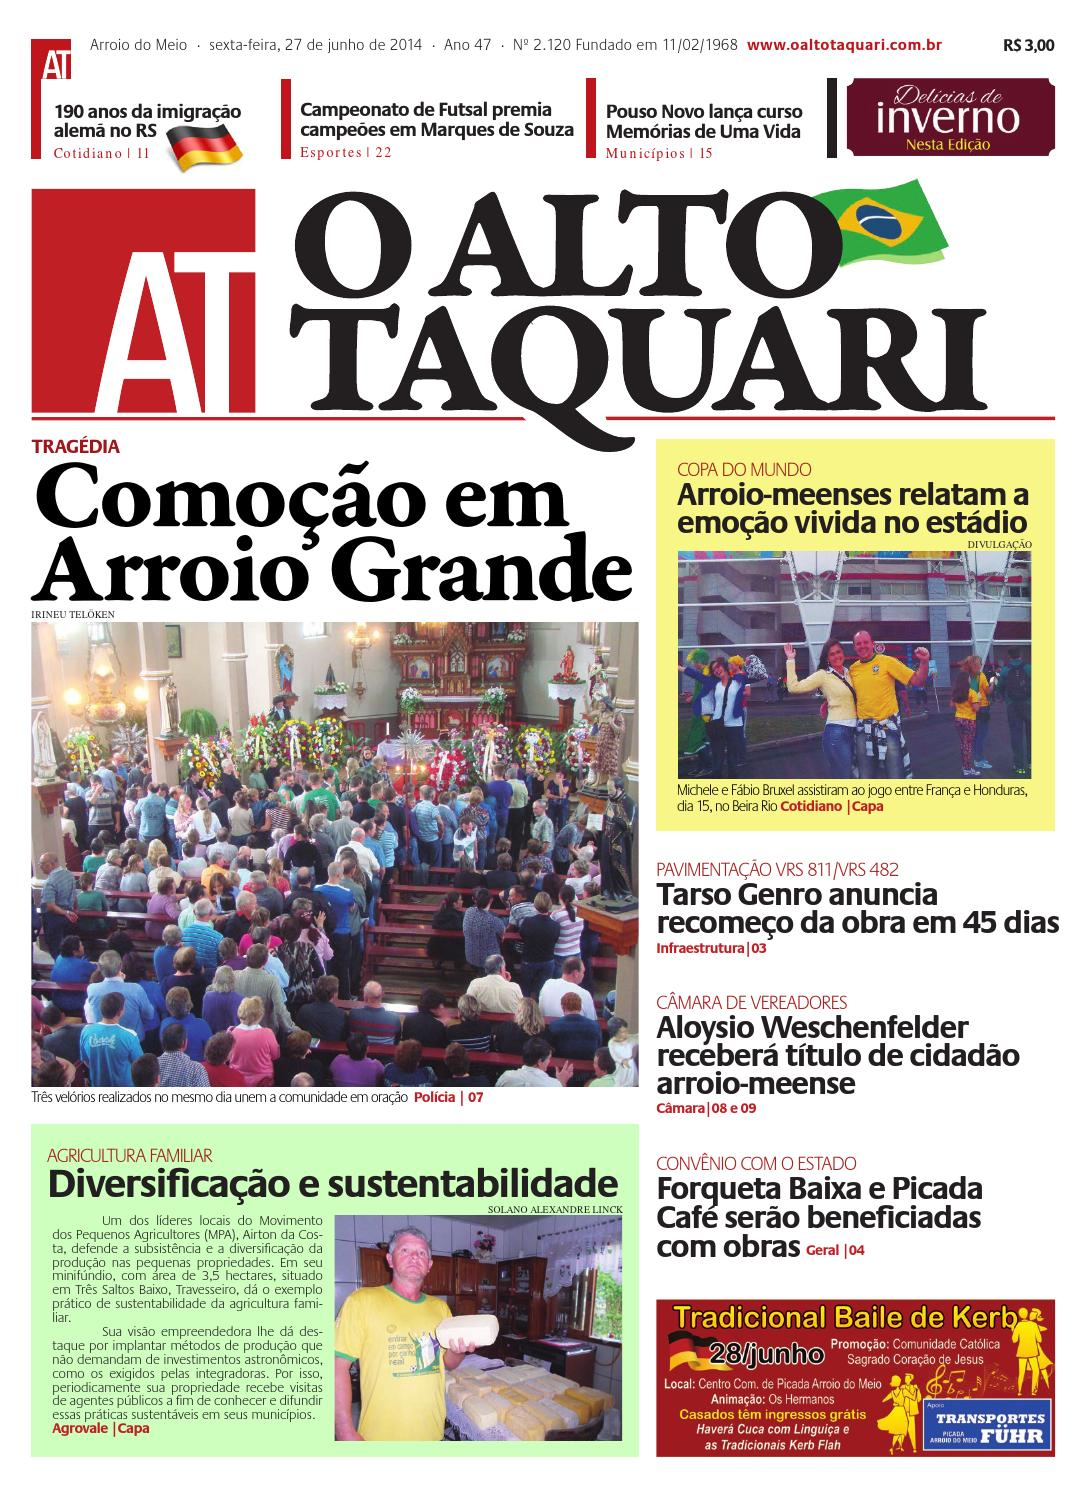 13a15fba42 Jornal O Alto Taquari - 27 de junho de 2014 by Jornal O Alto Taquari - issuu